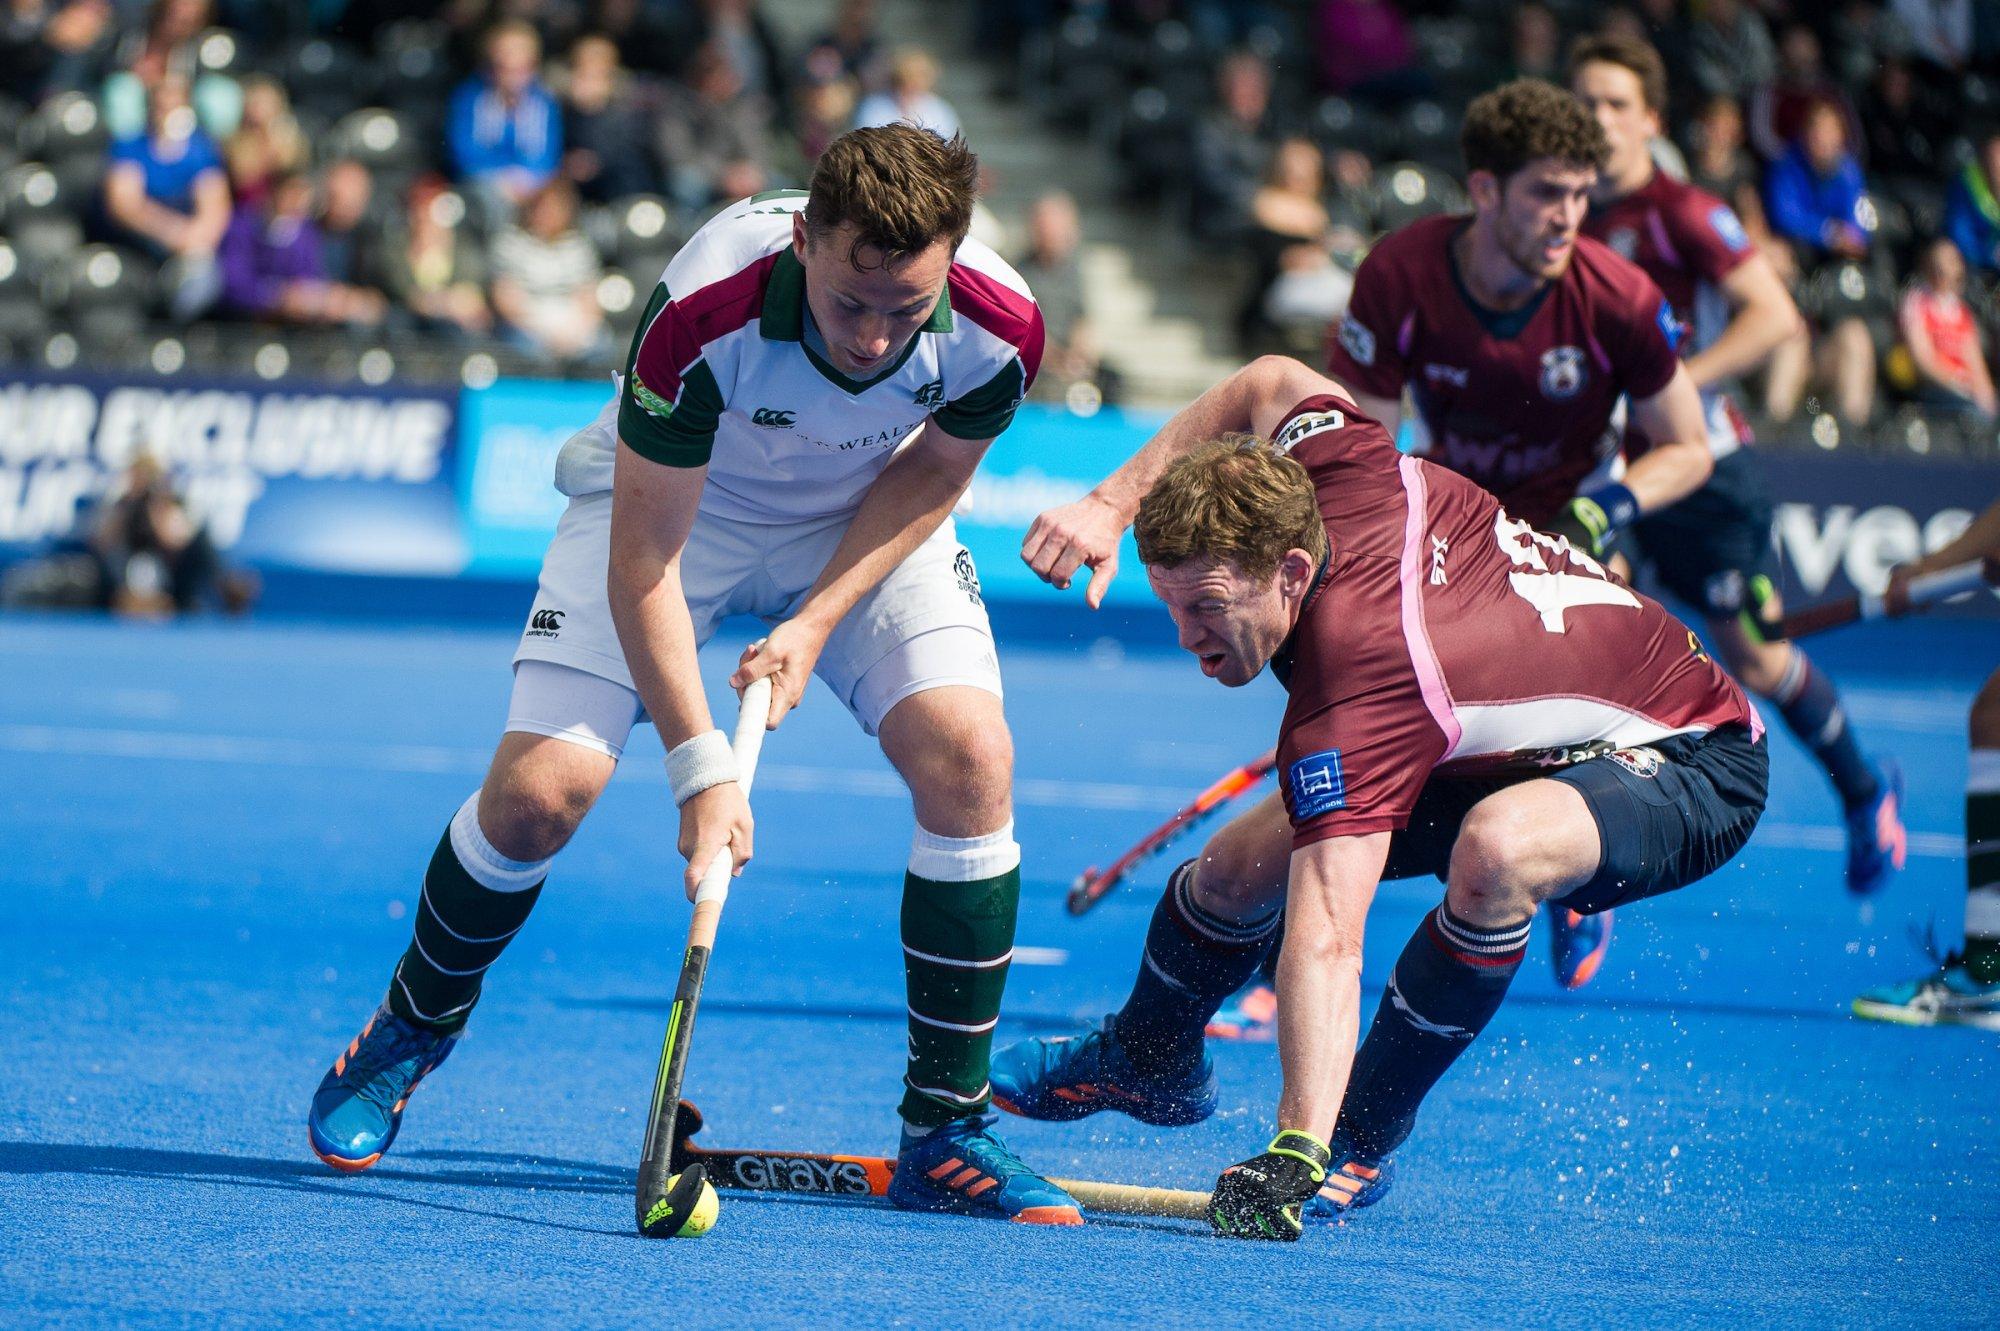 Alan Forsyth hockey